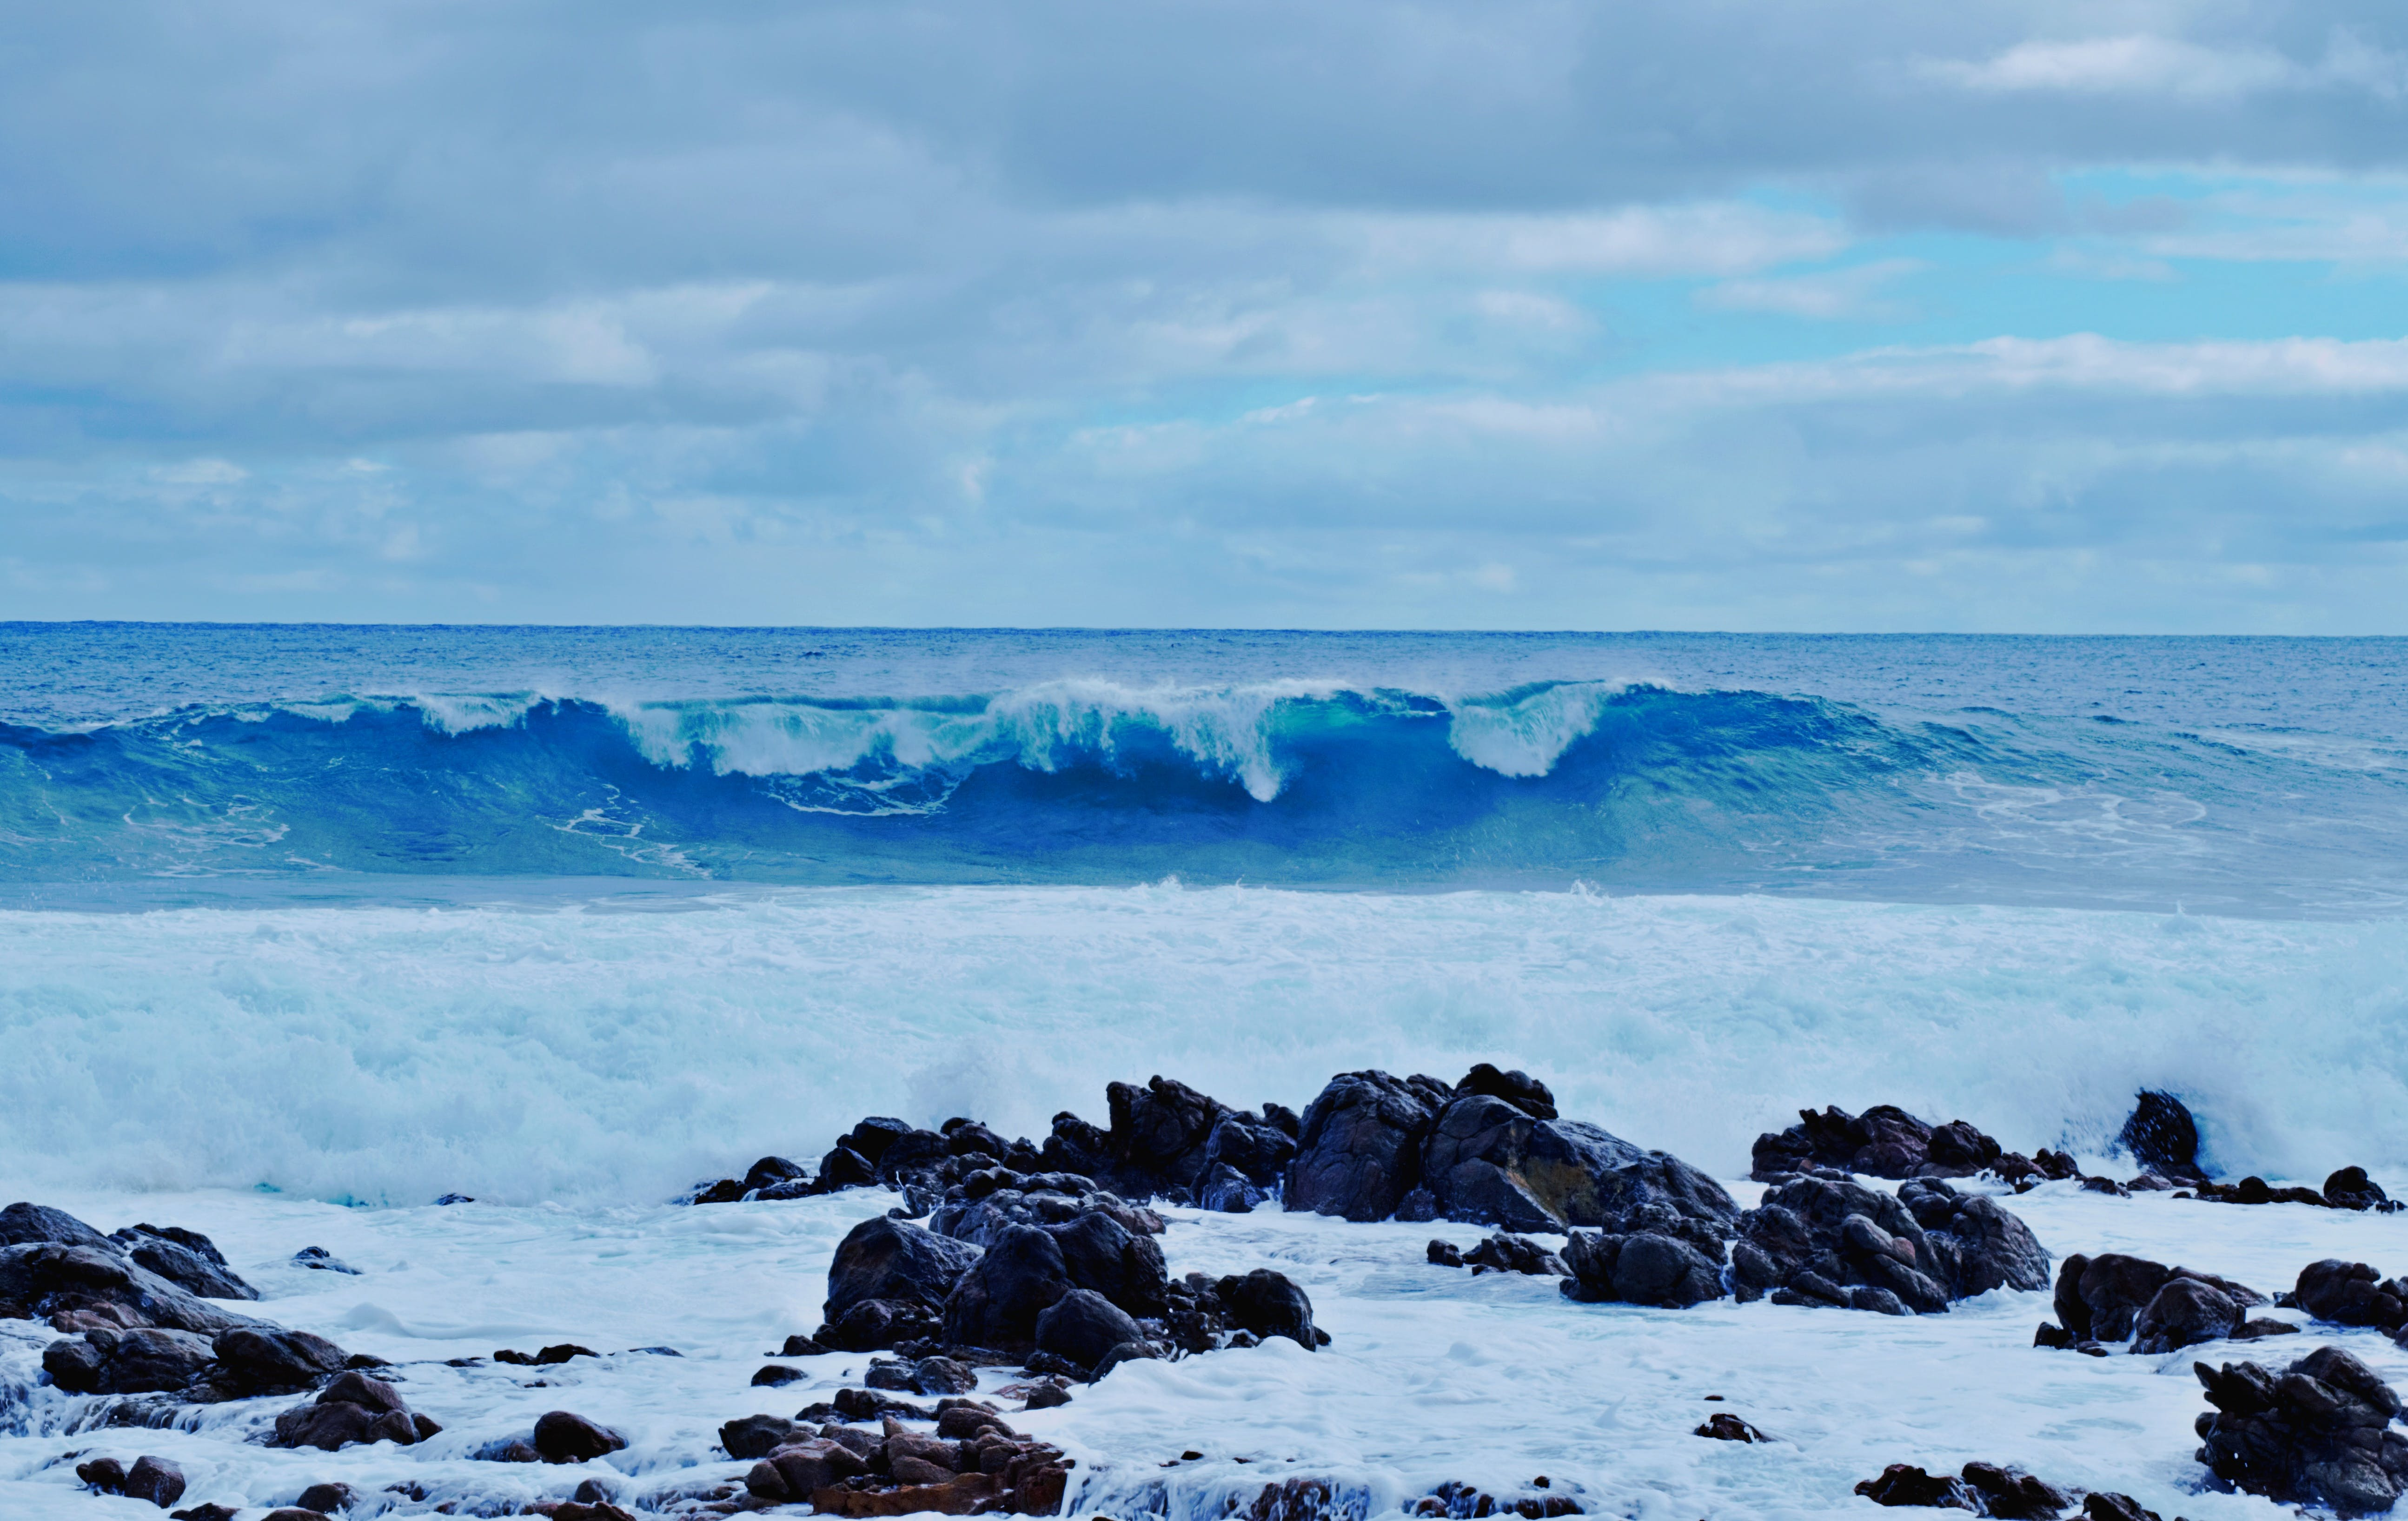 Immagine gratuita di oceano, oceano blu, oceano indiano, onde